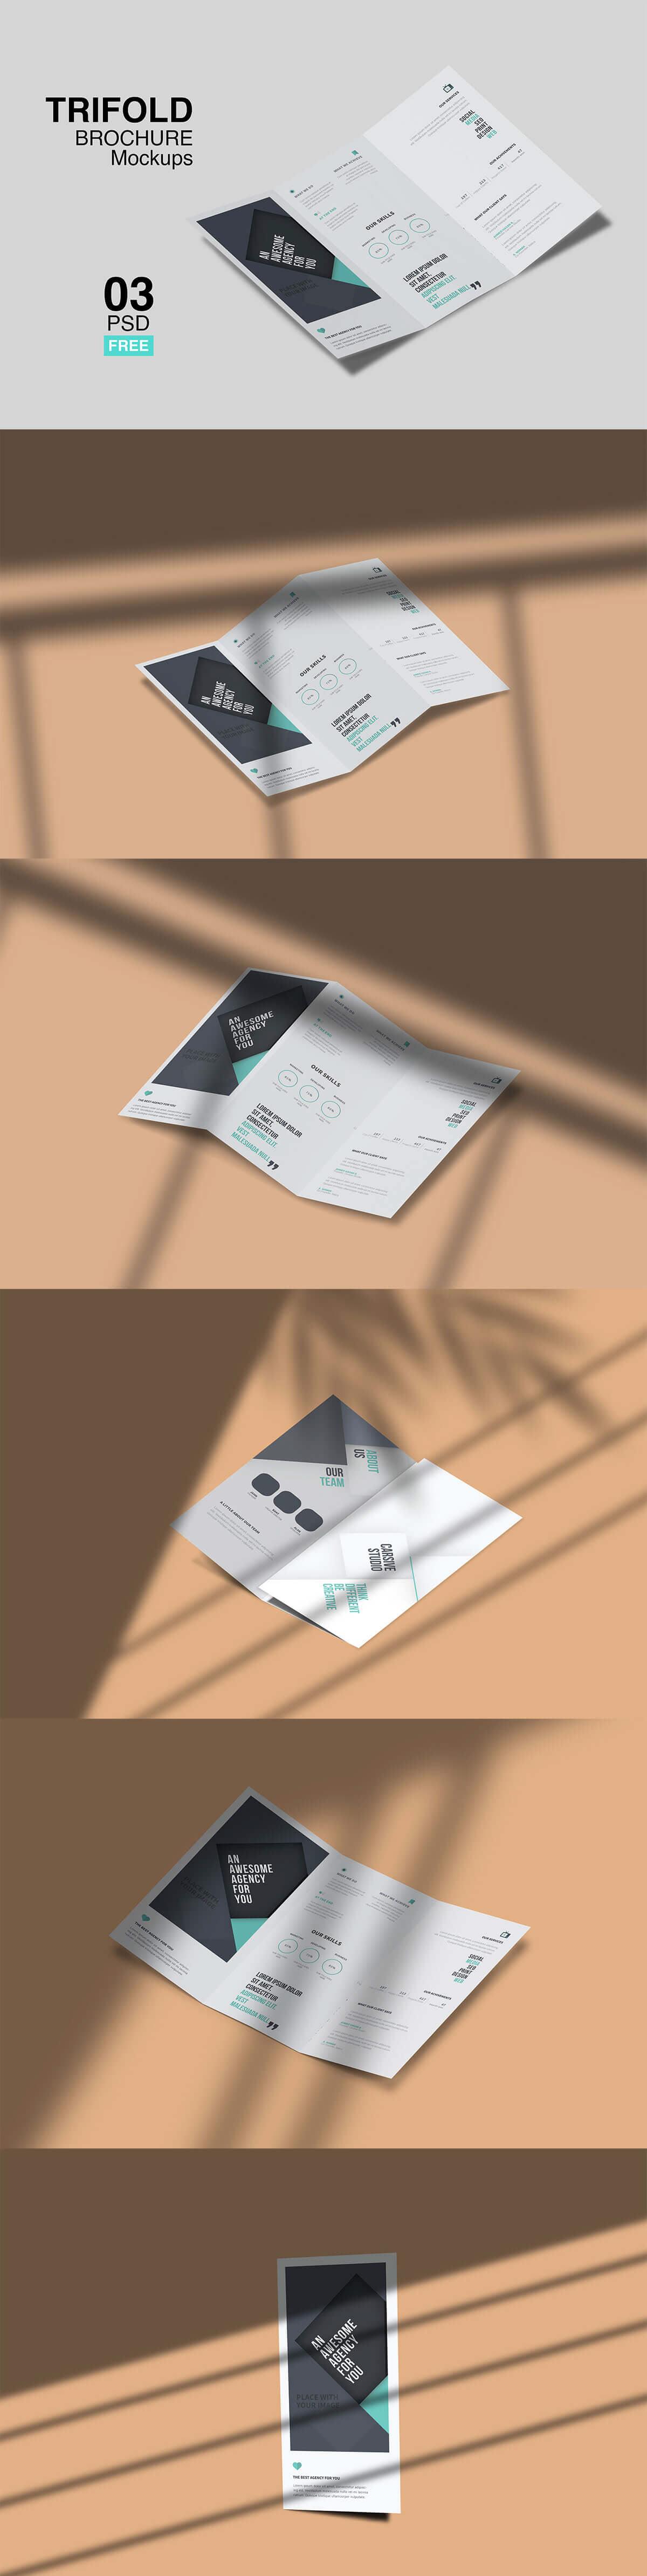 Free Trifold Brochure Mockup Templates